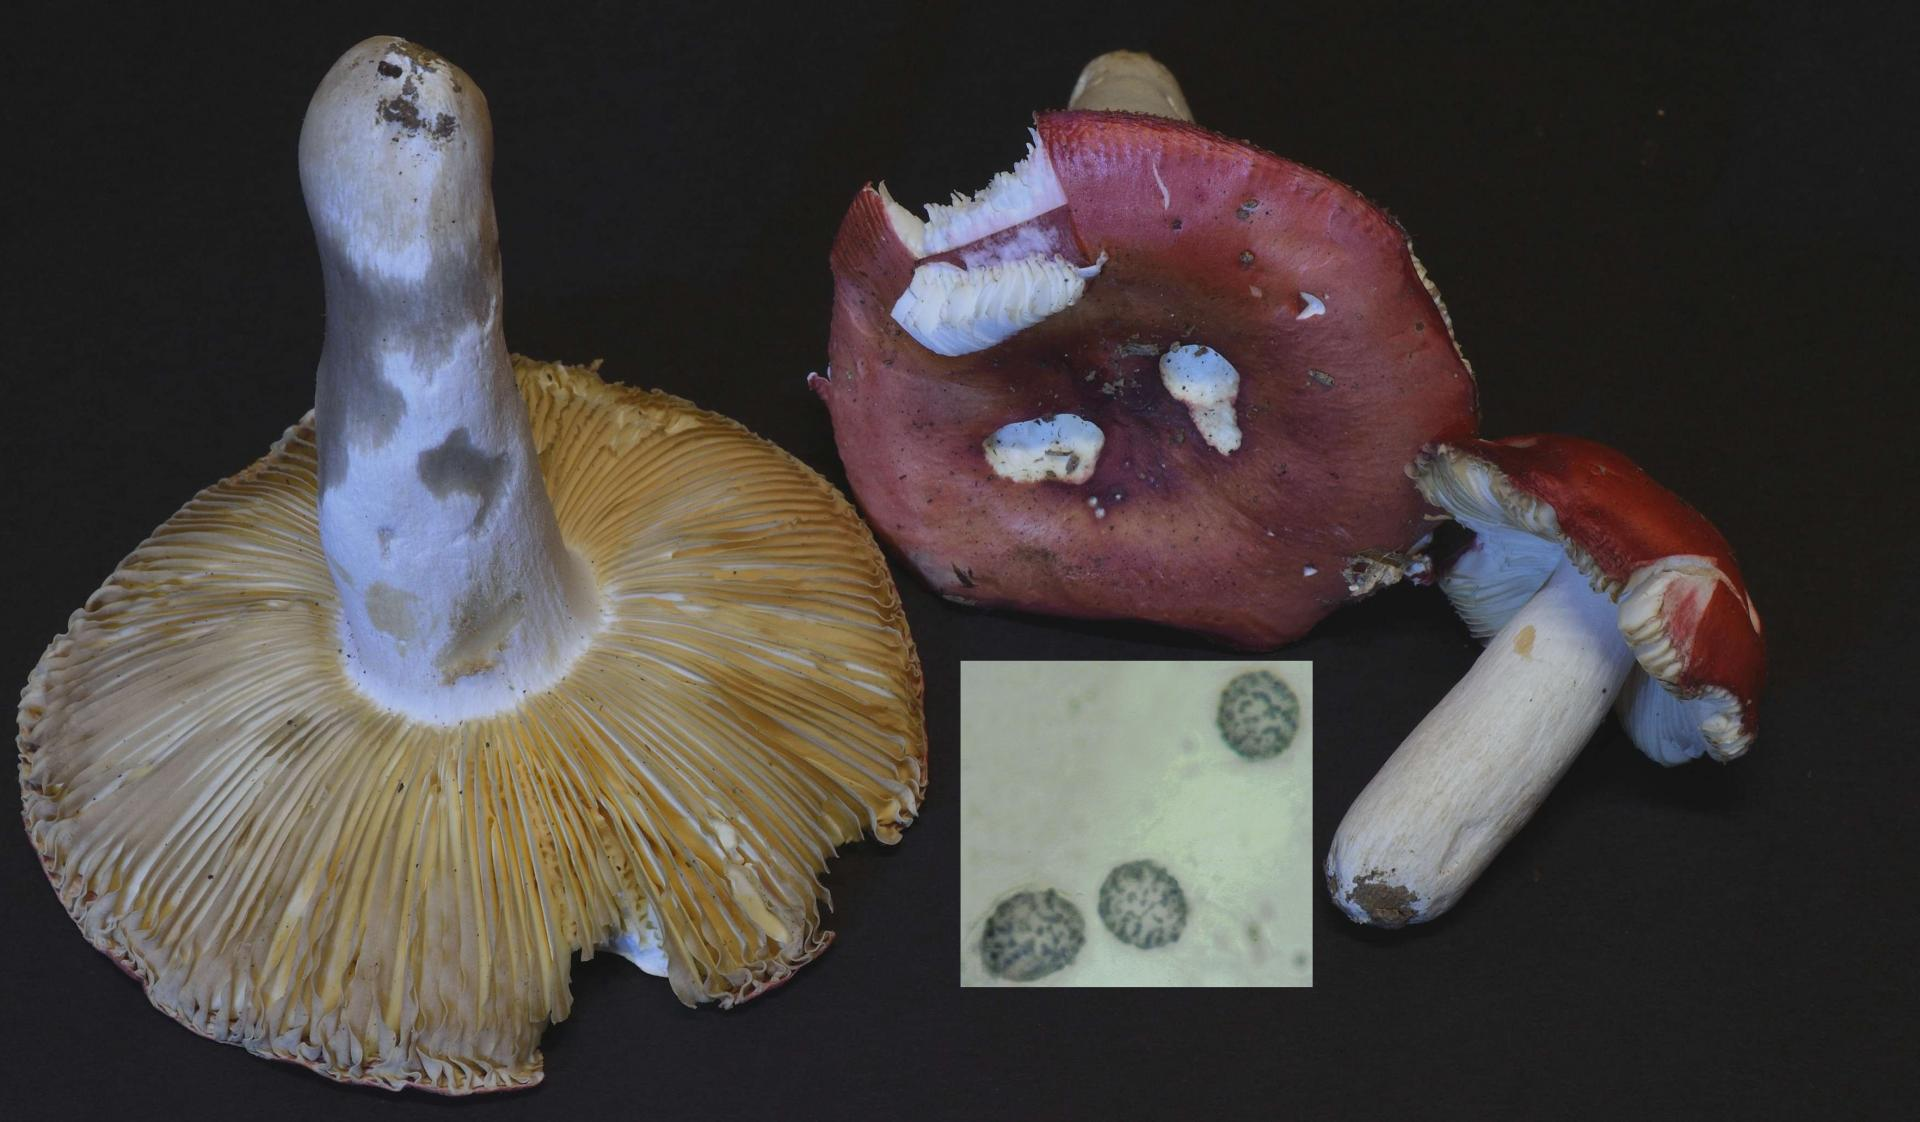 Russula pseudointegra